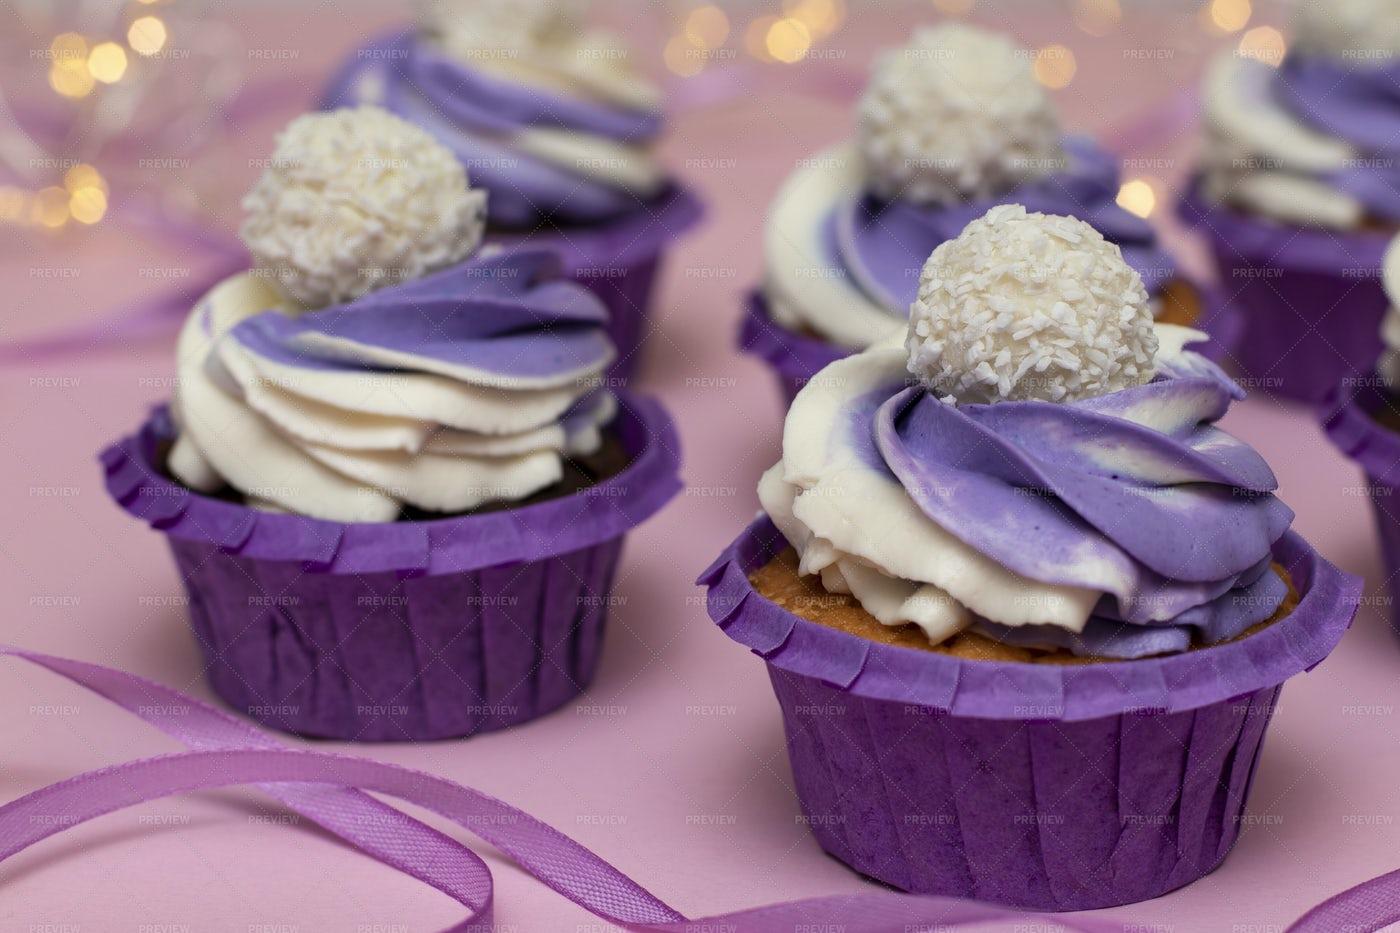 Cupcakes With Lilac Cream: Stock Photos